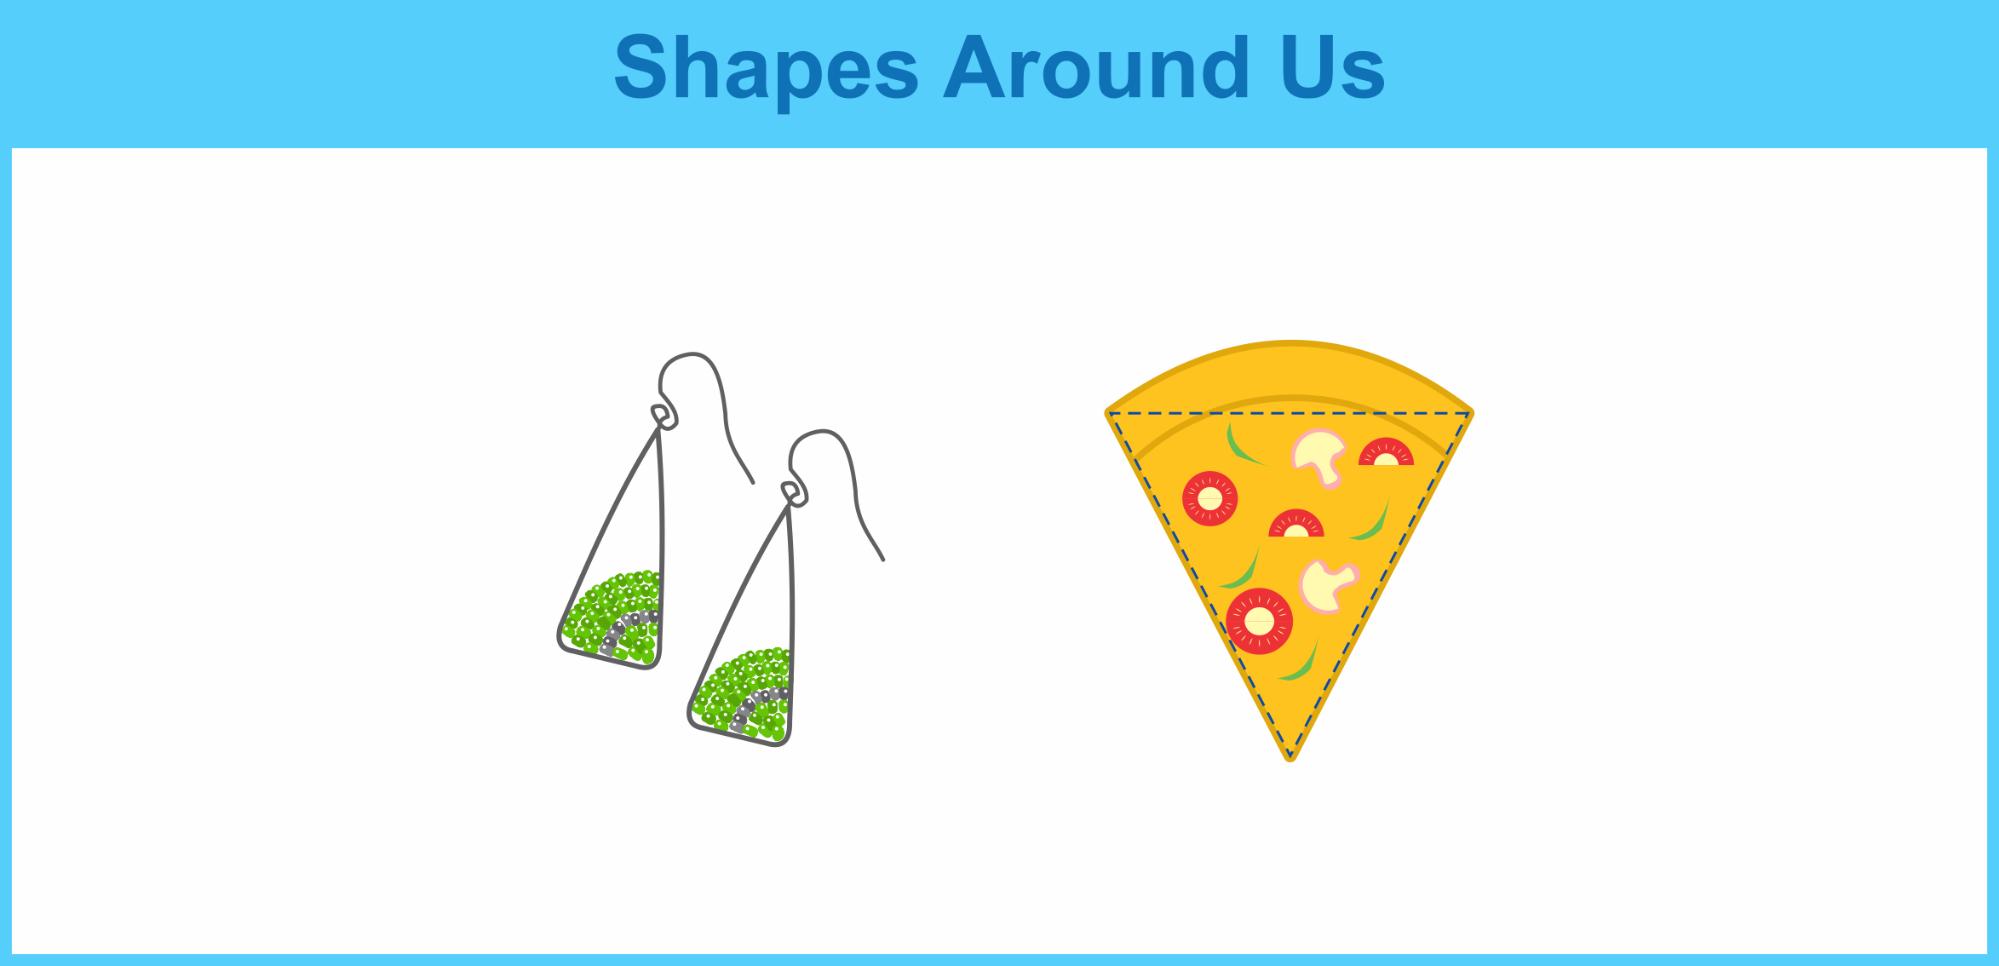 isosceles triangle shapes around us